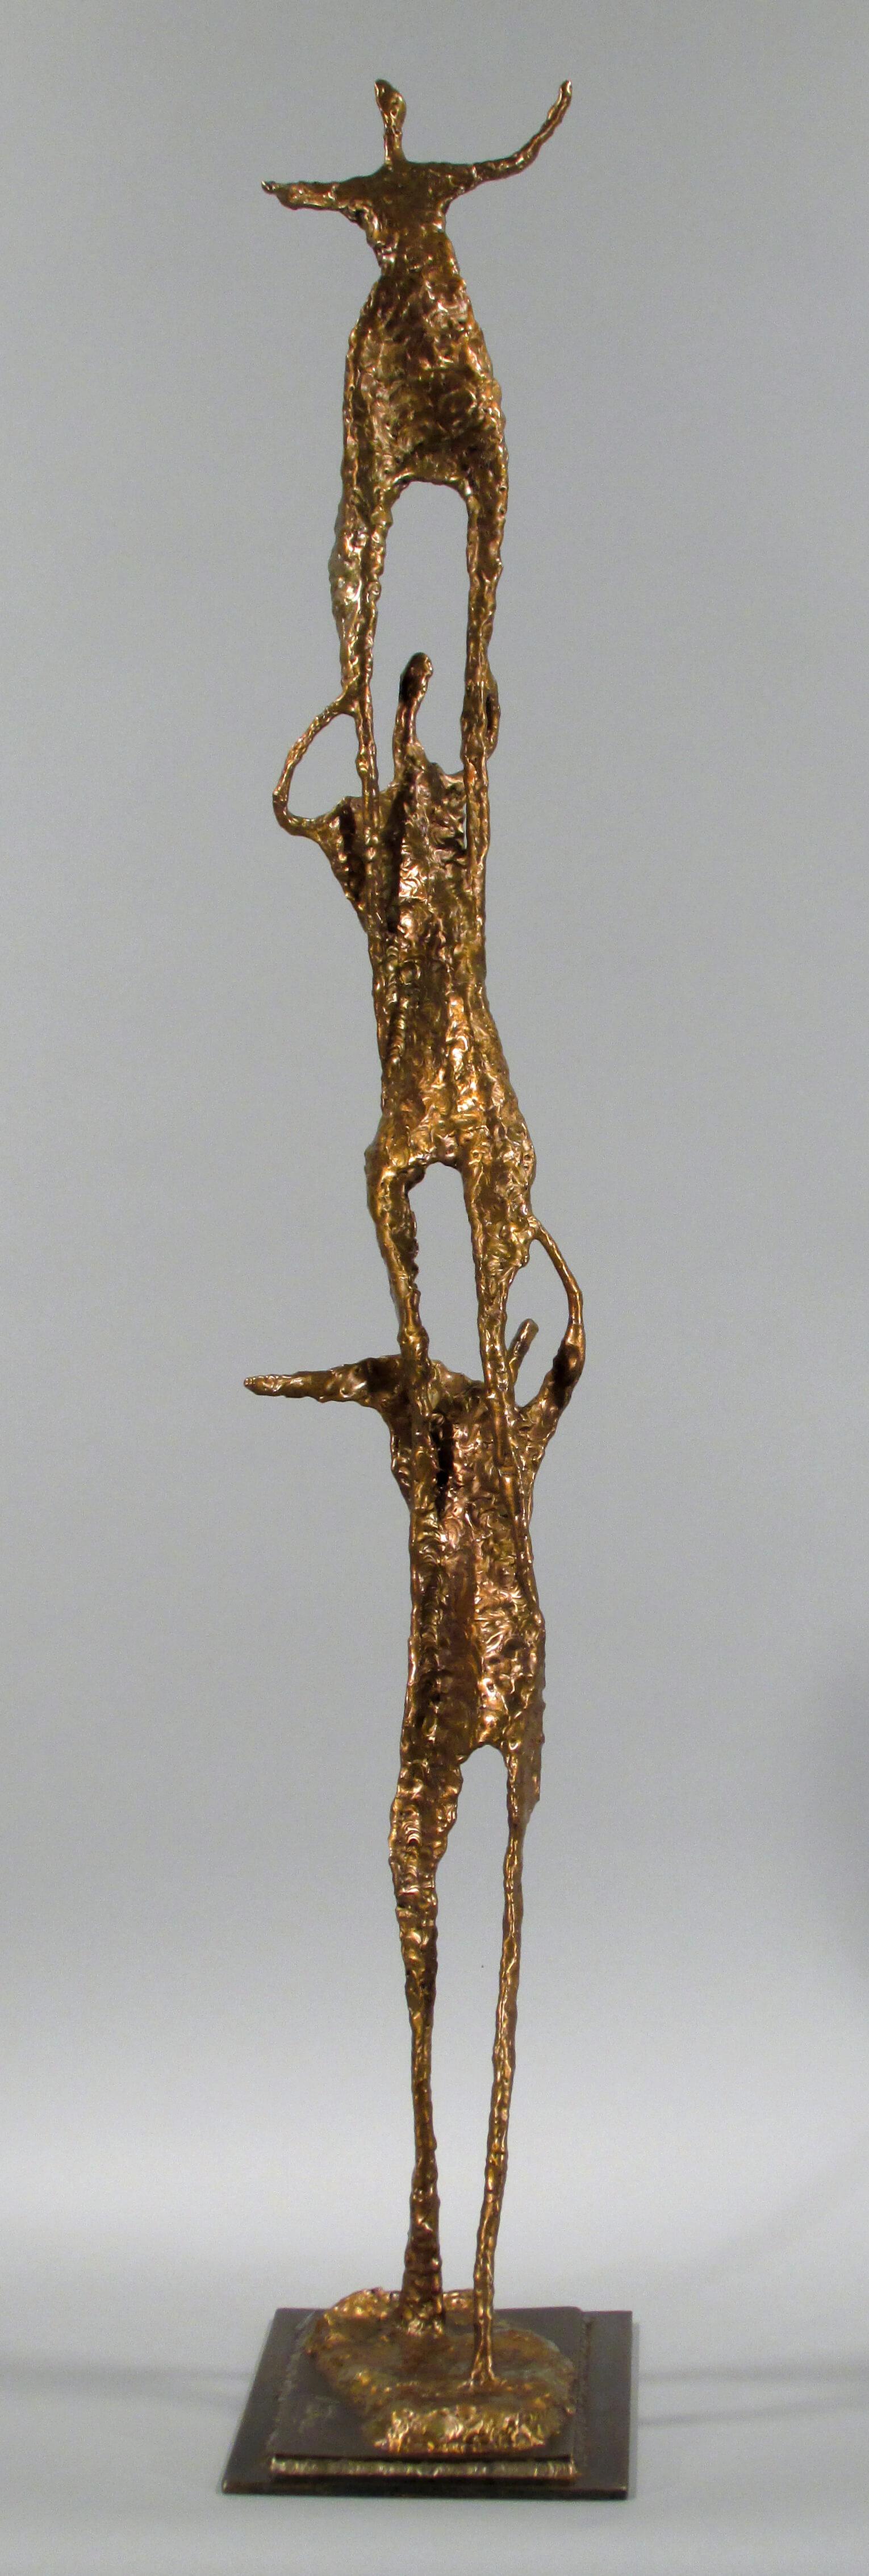 Sculpture de bronze par Matthieu Binette